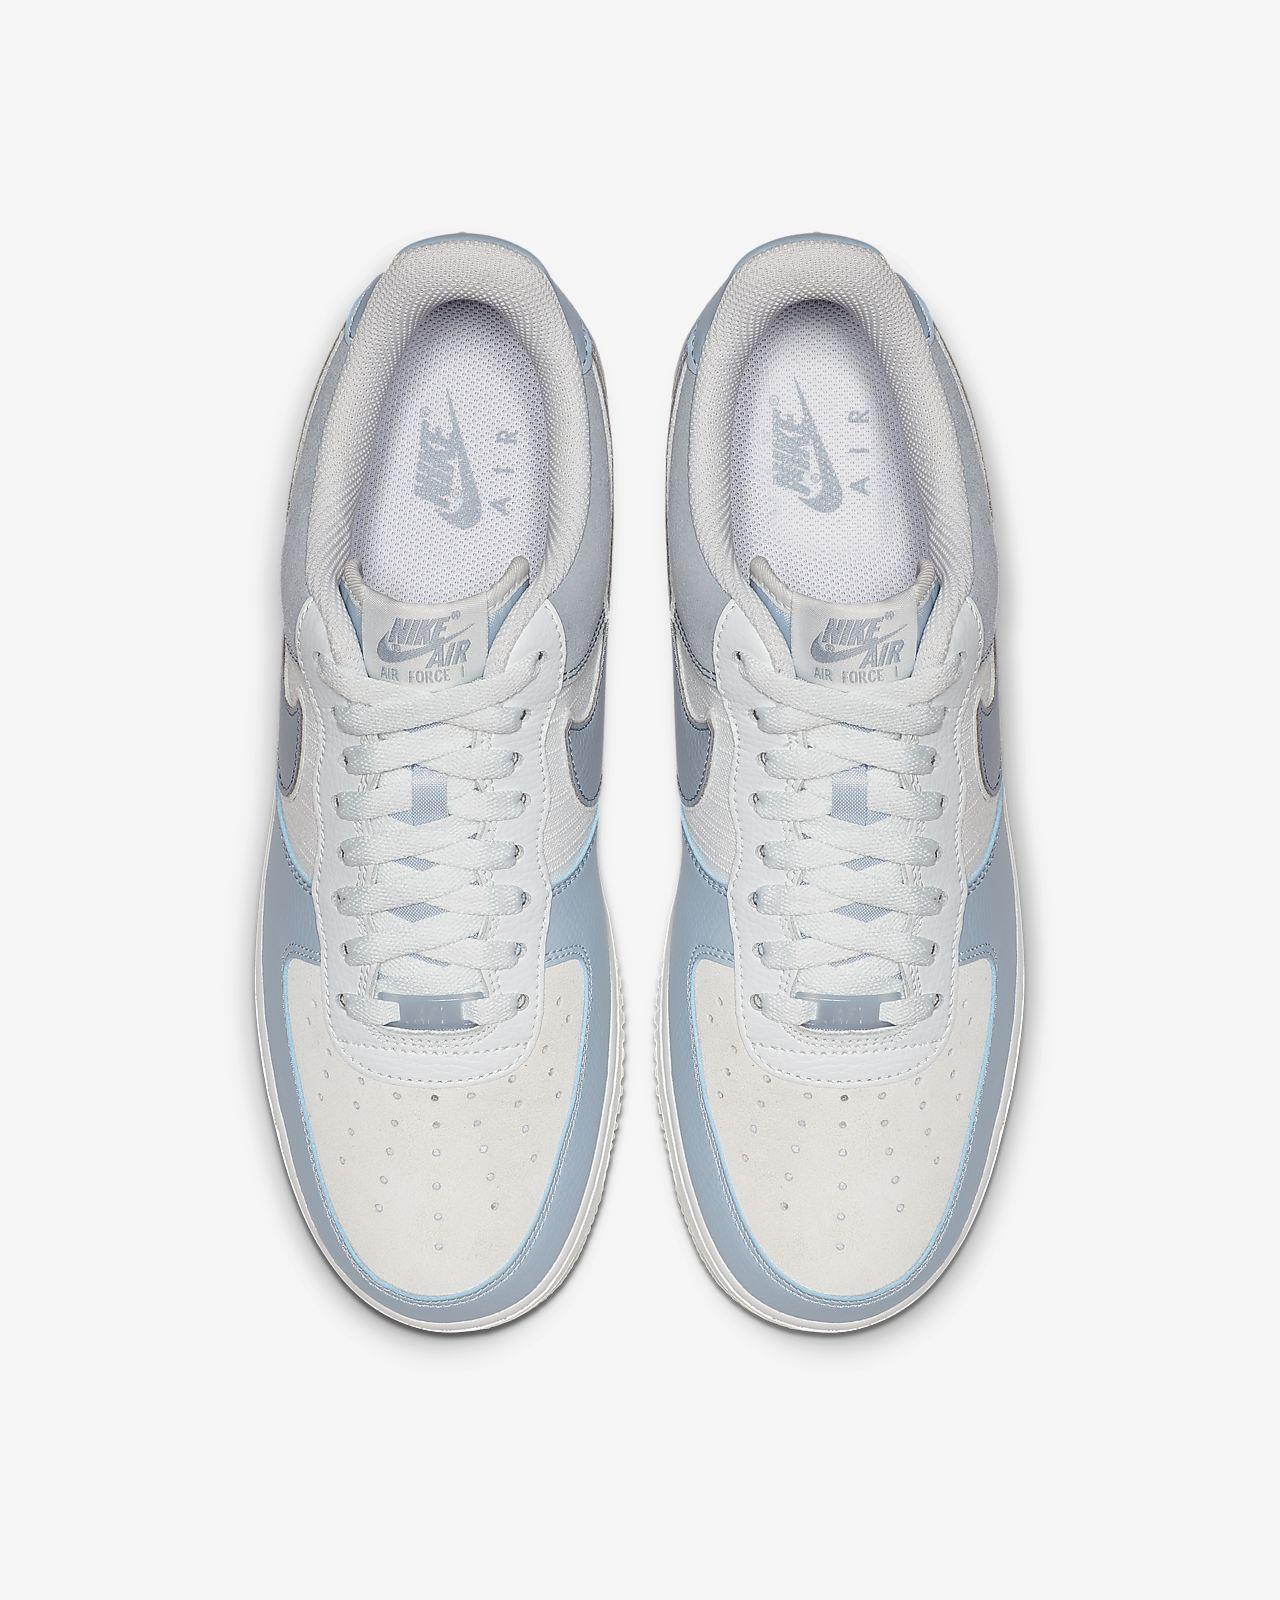 Force 1 2 Nike Homme Lv8 '07 Pour Air Chaussure 35F1uTlcKJ